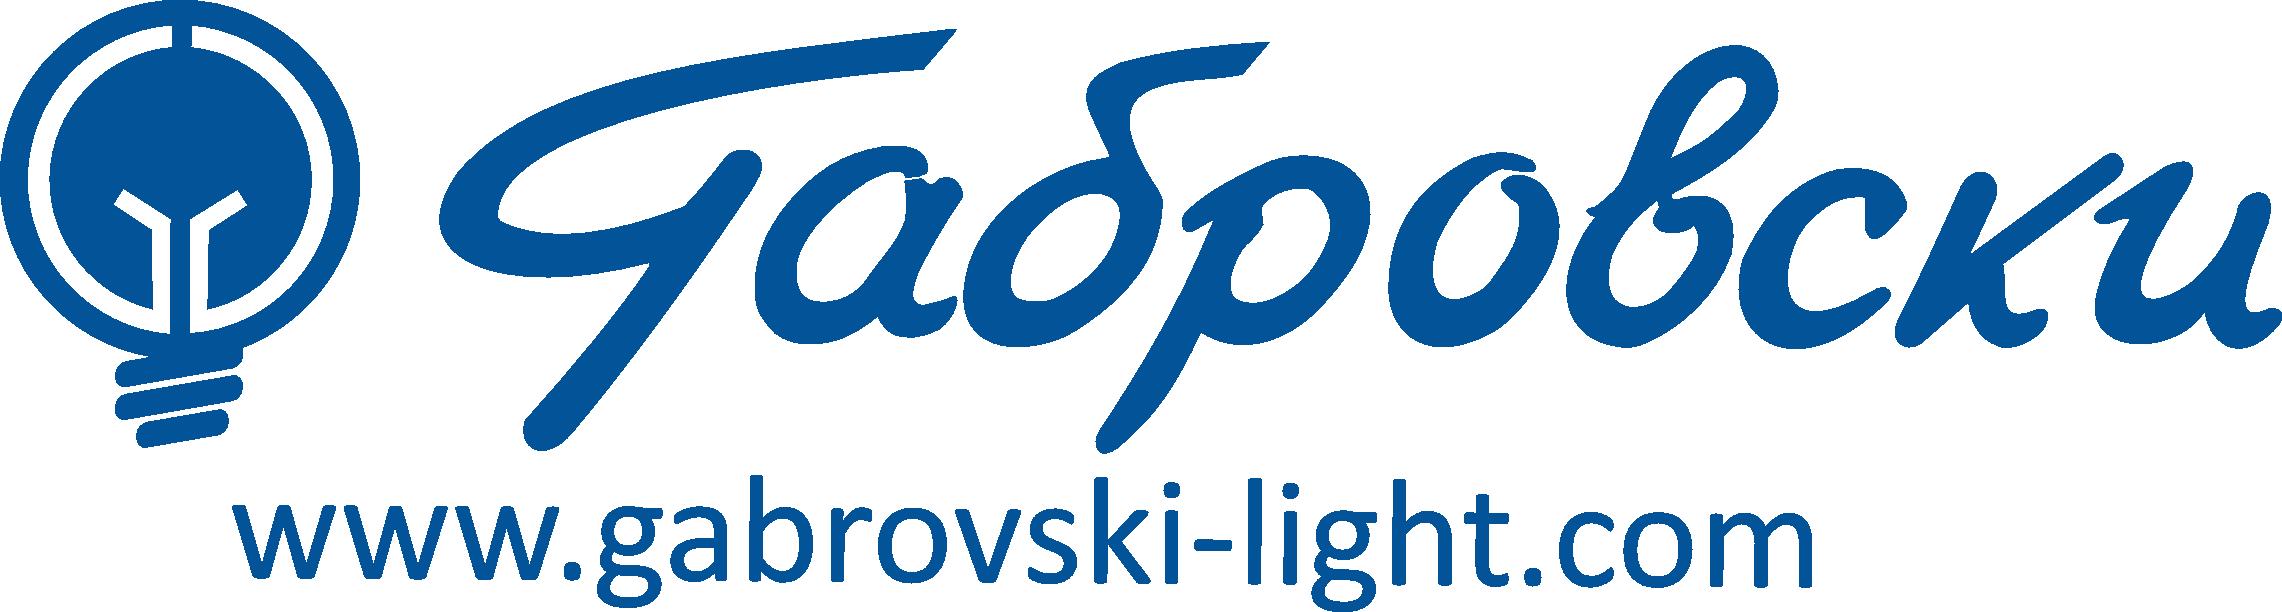 www.gabrovski-light.com